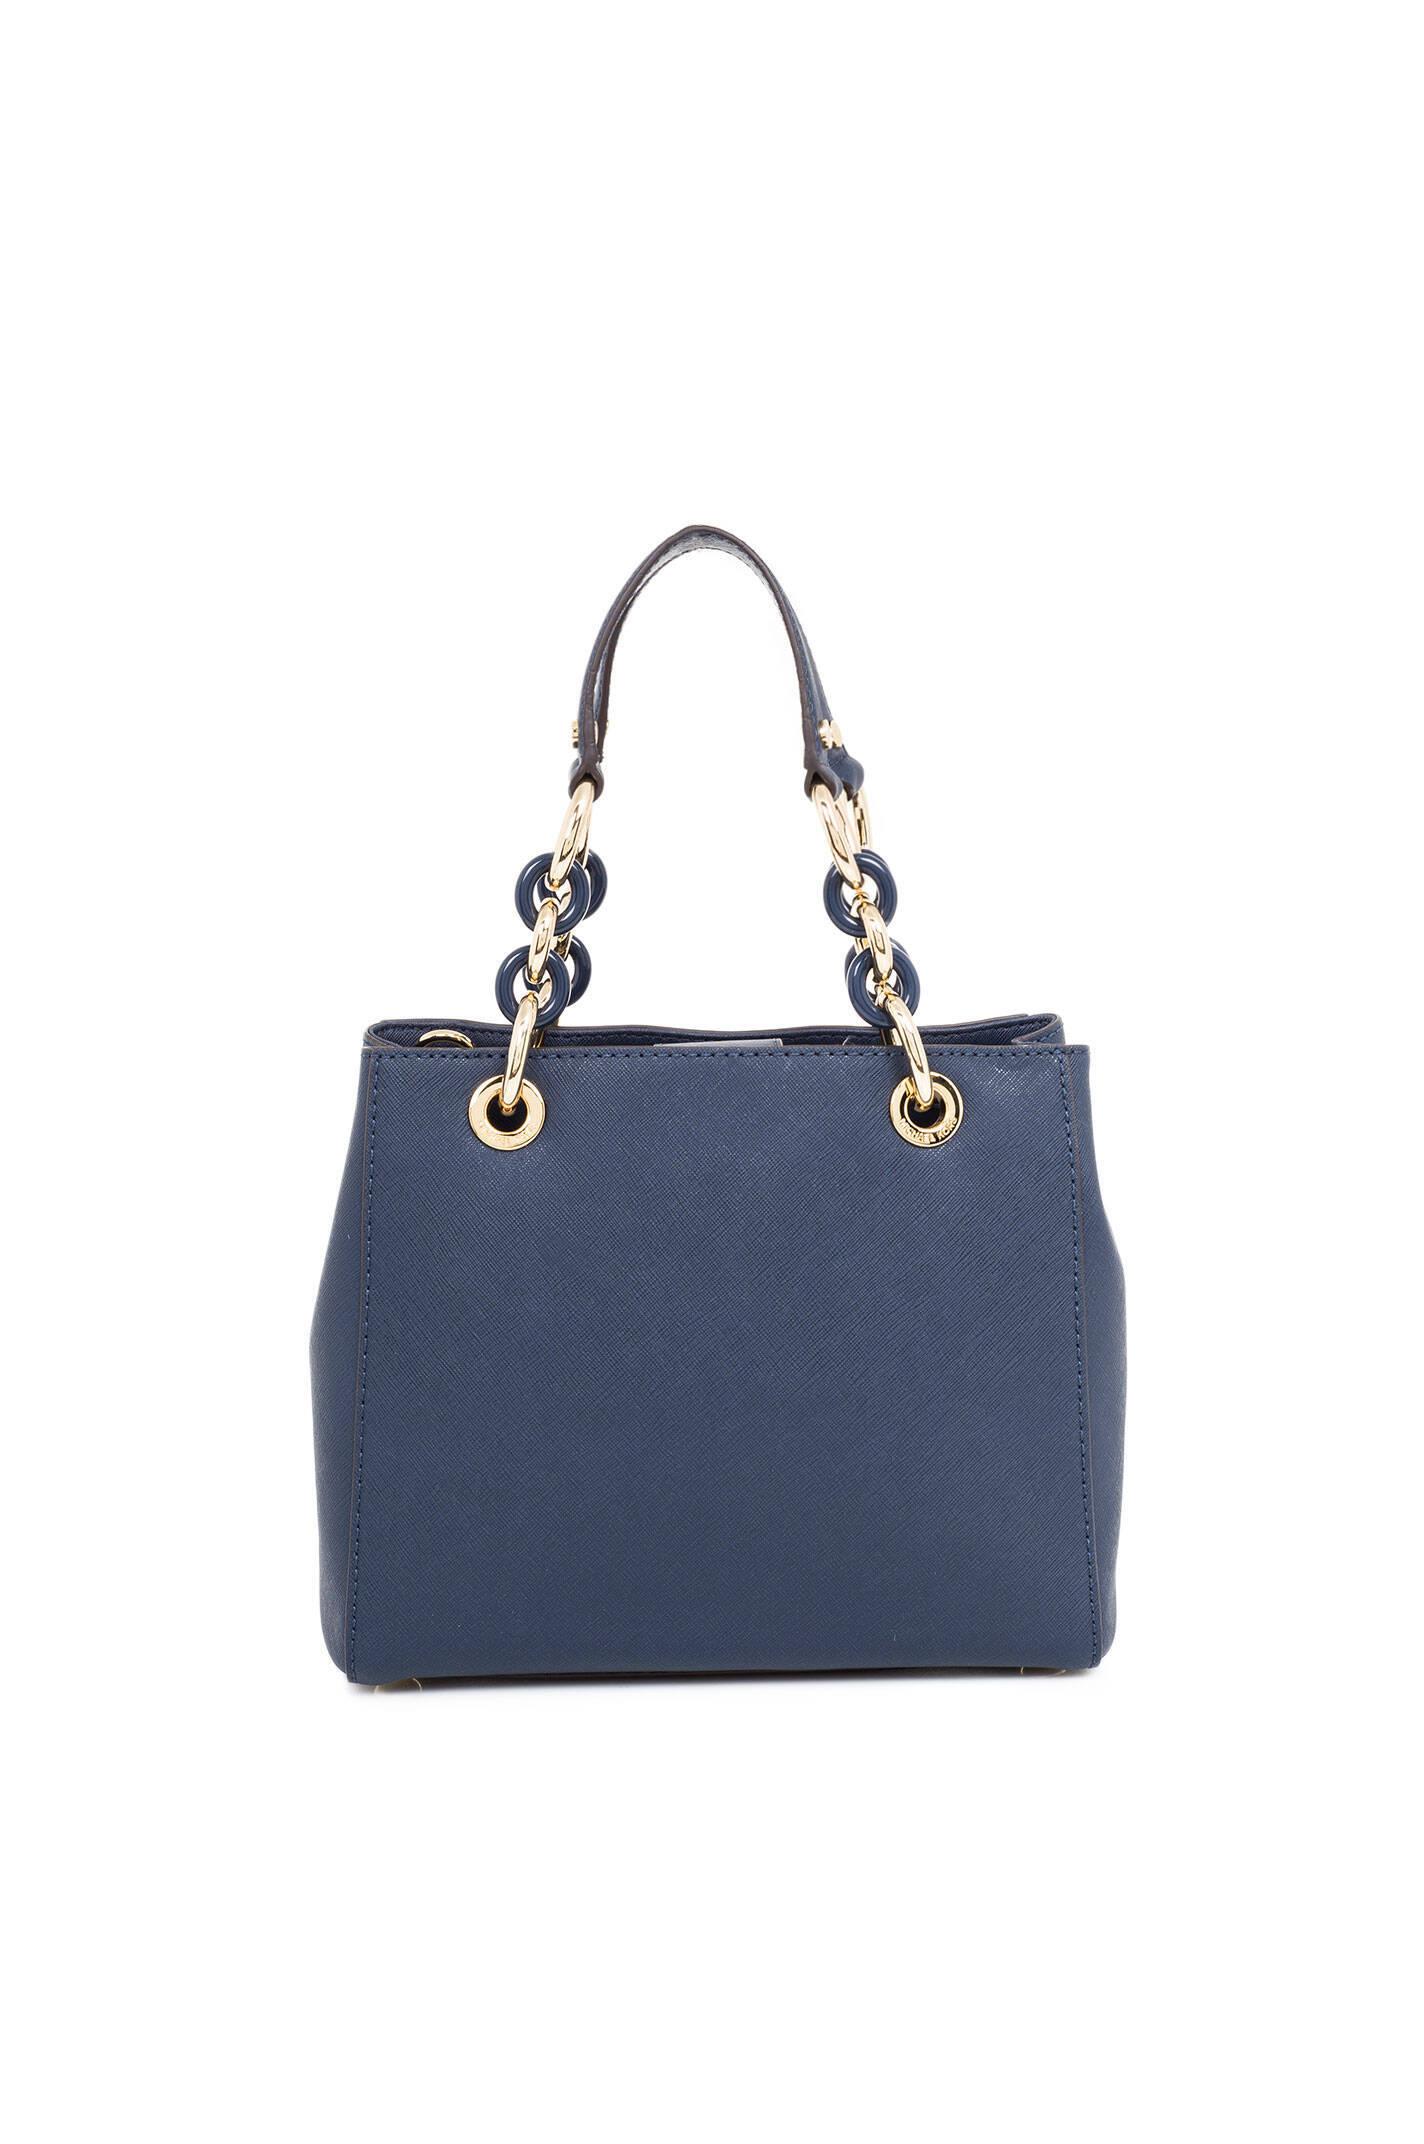 cynthia shopper bag michael kors navy blue bags. Black Bedroom Furniture Sets. Home Design Ideas